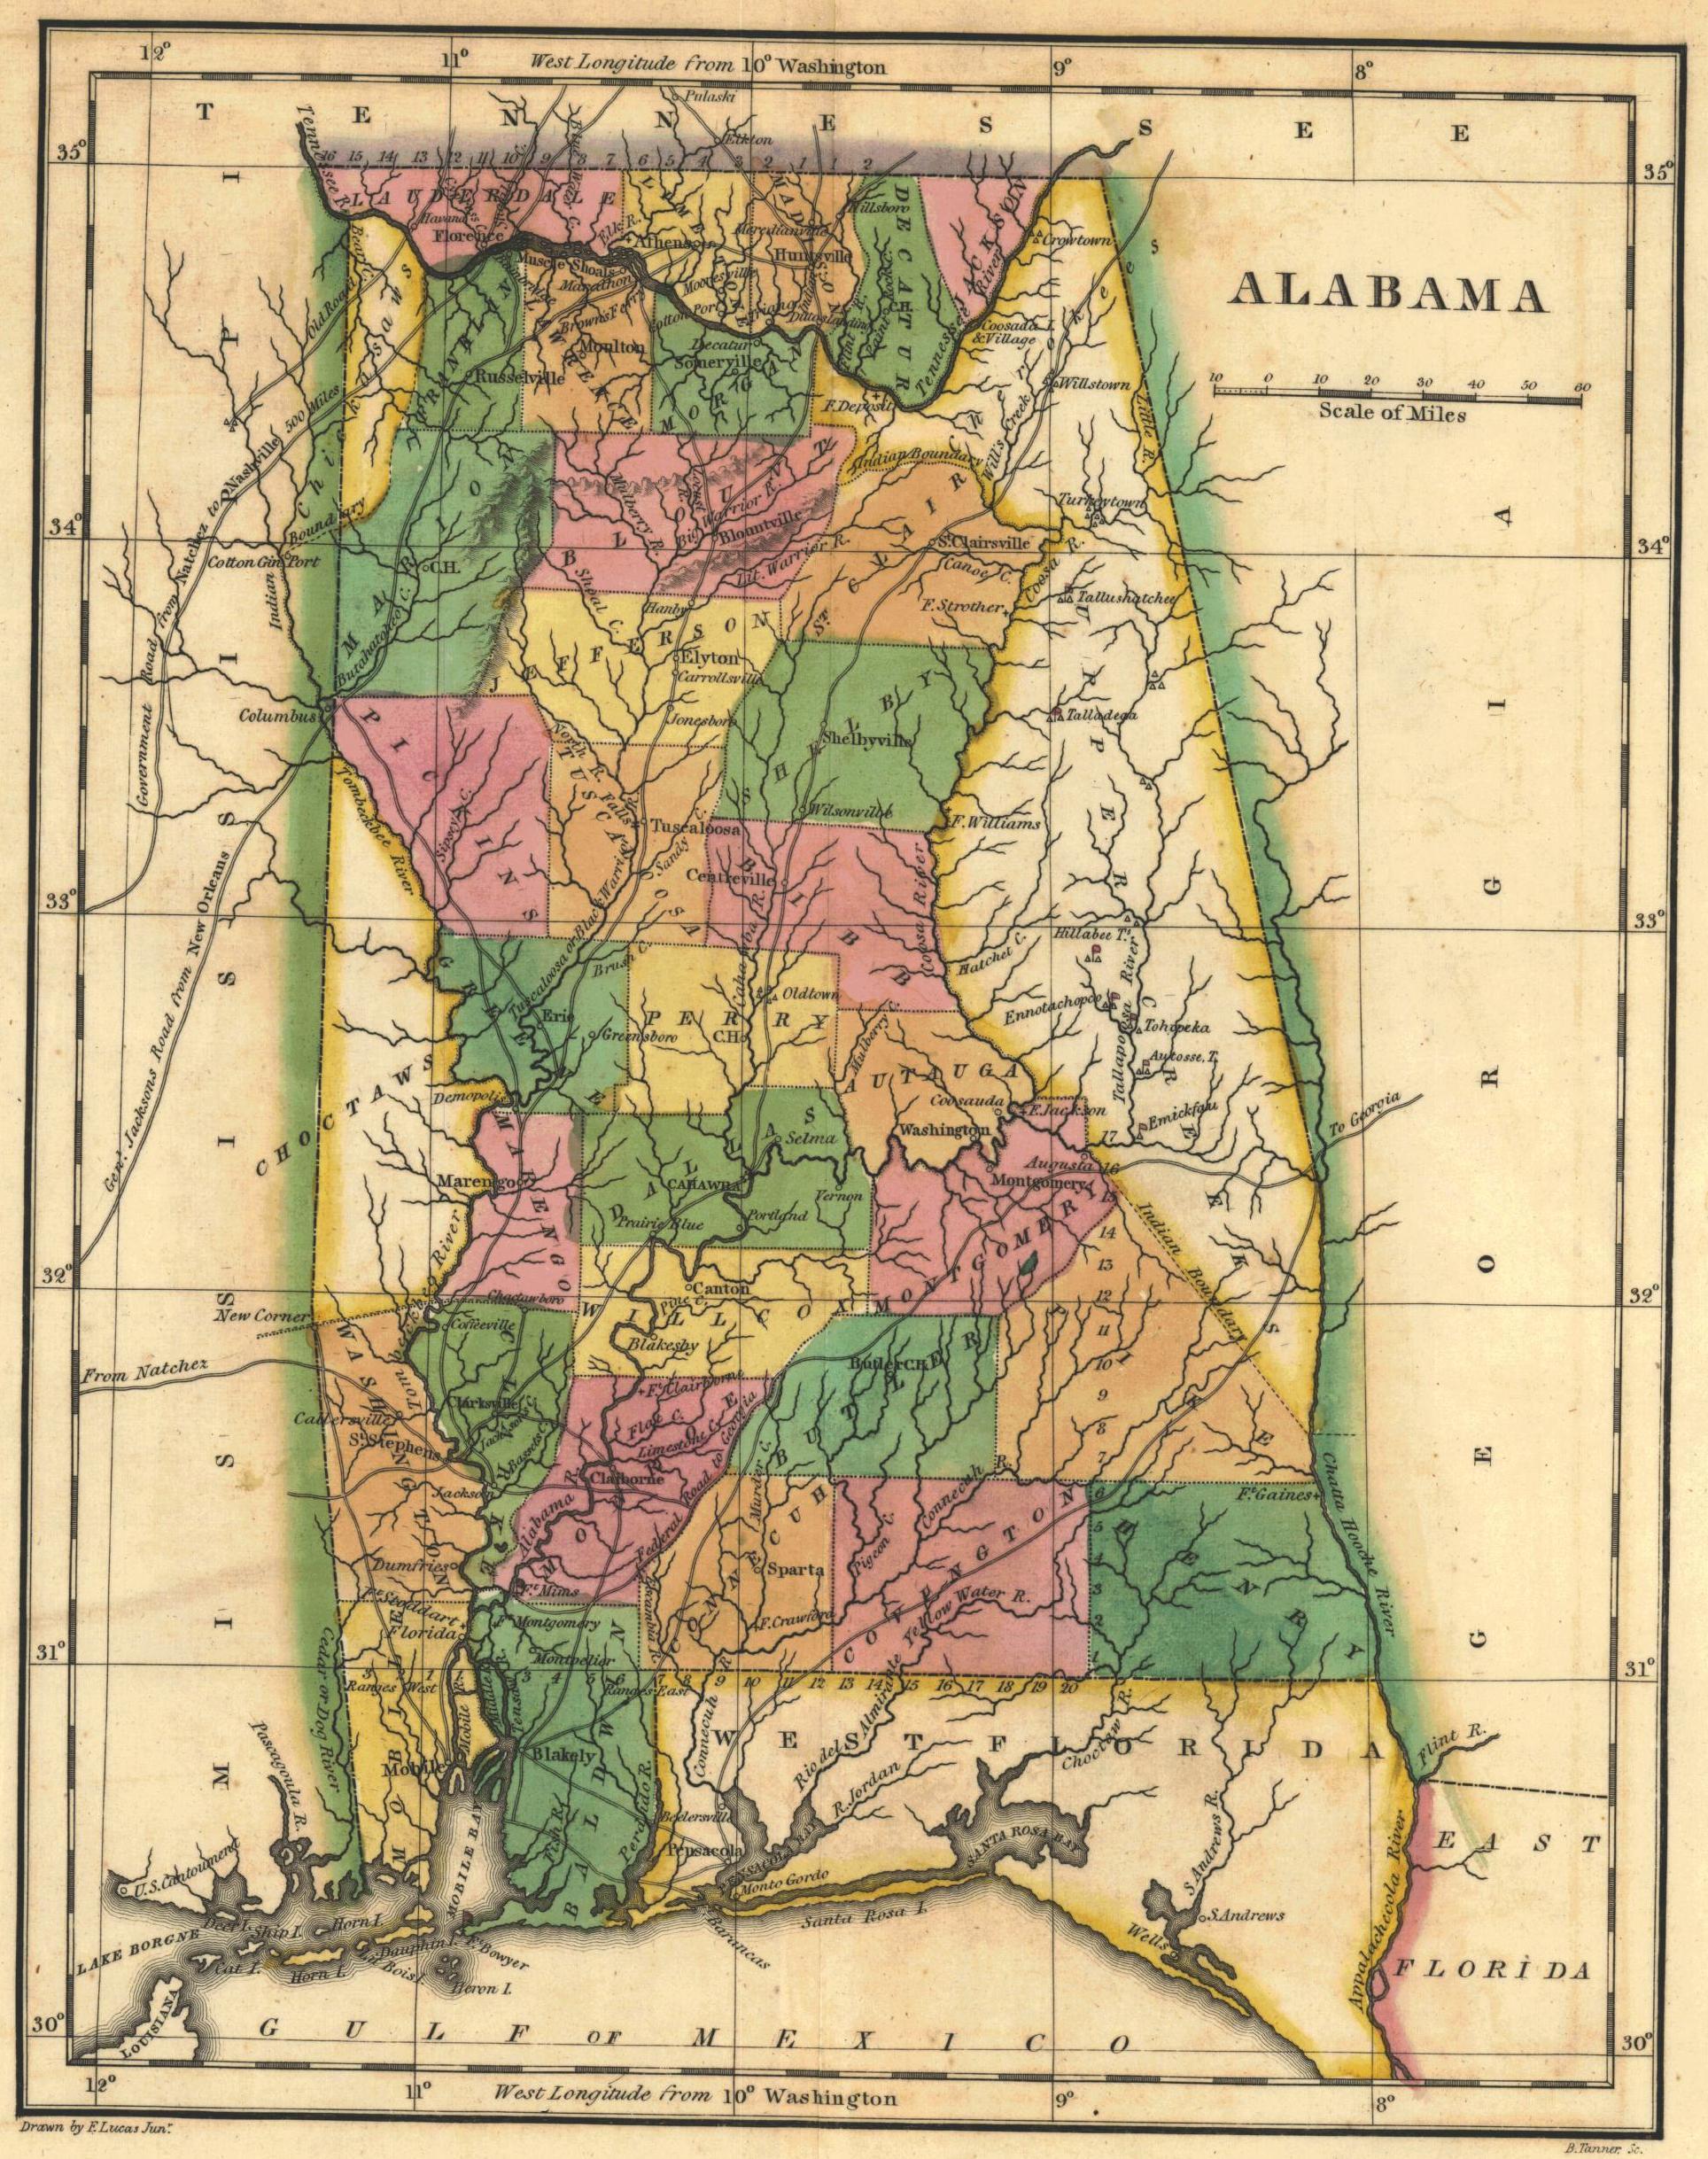 File:1822 Map of Alabama counties.JPG - Wikimedia Commons